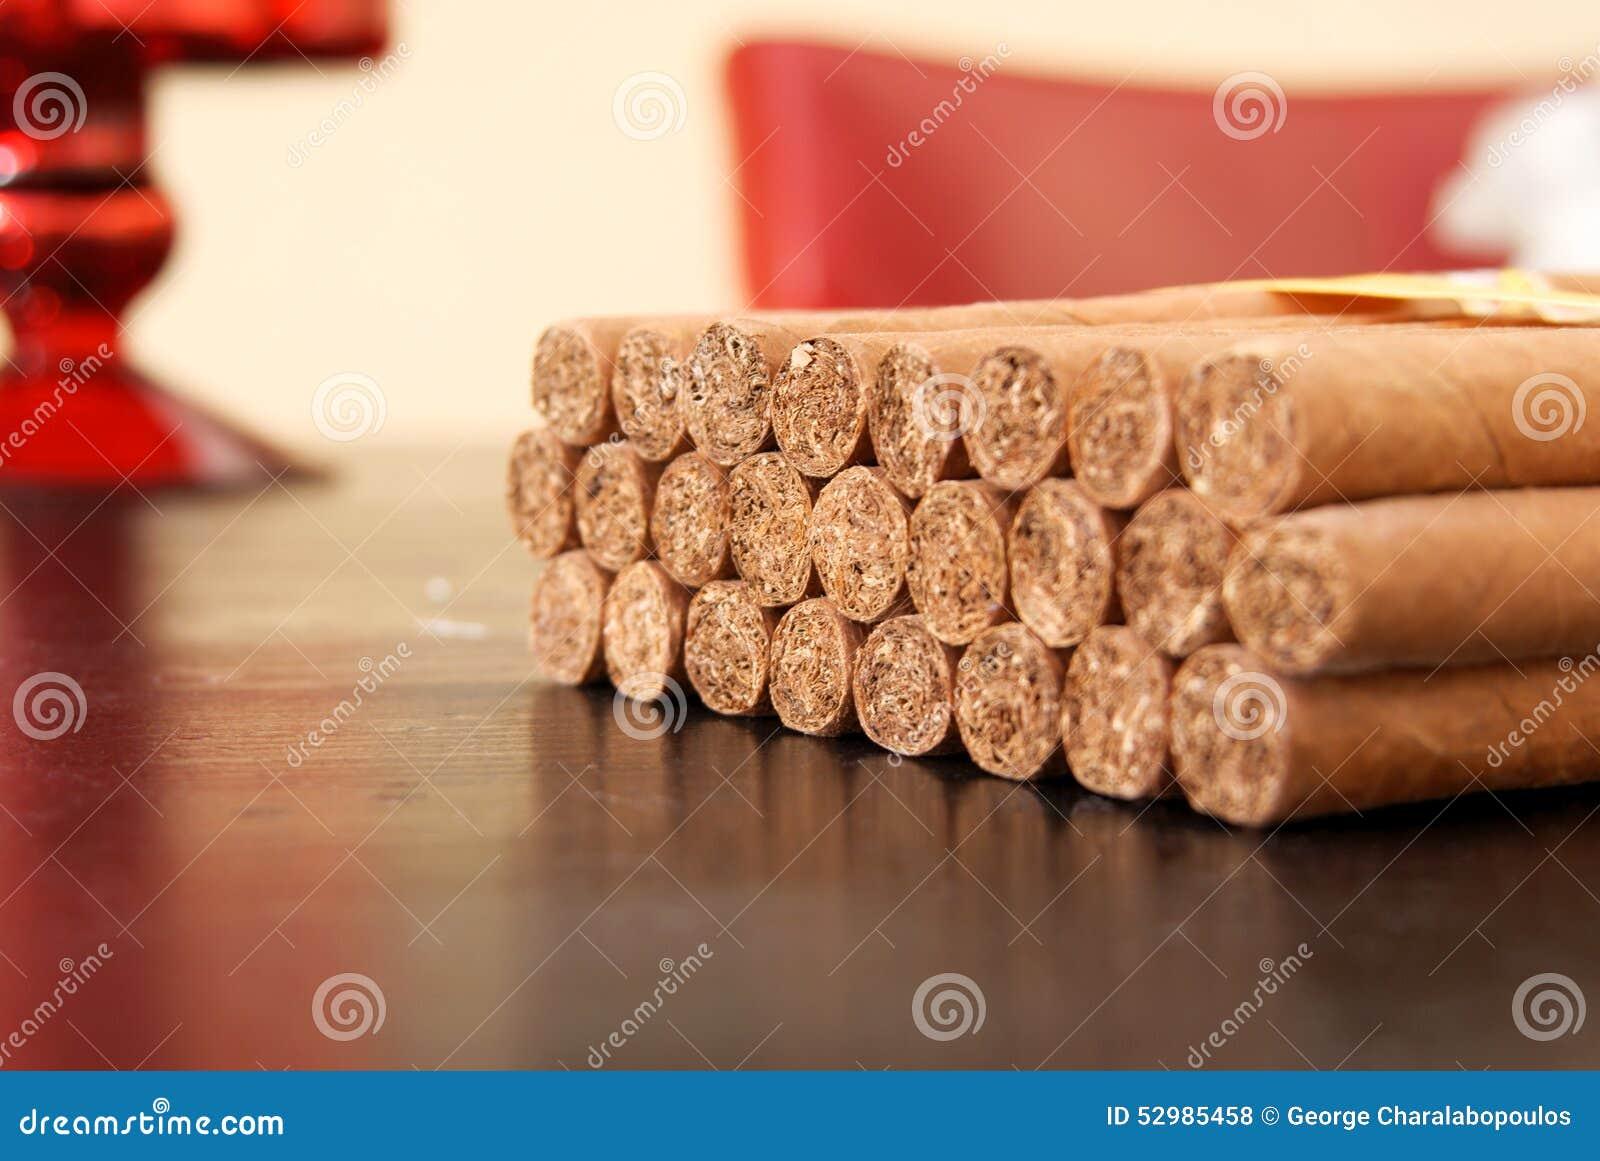 Kubanische Zigarren auf dem Tisch